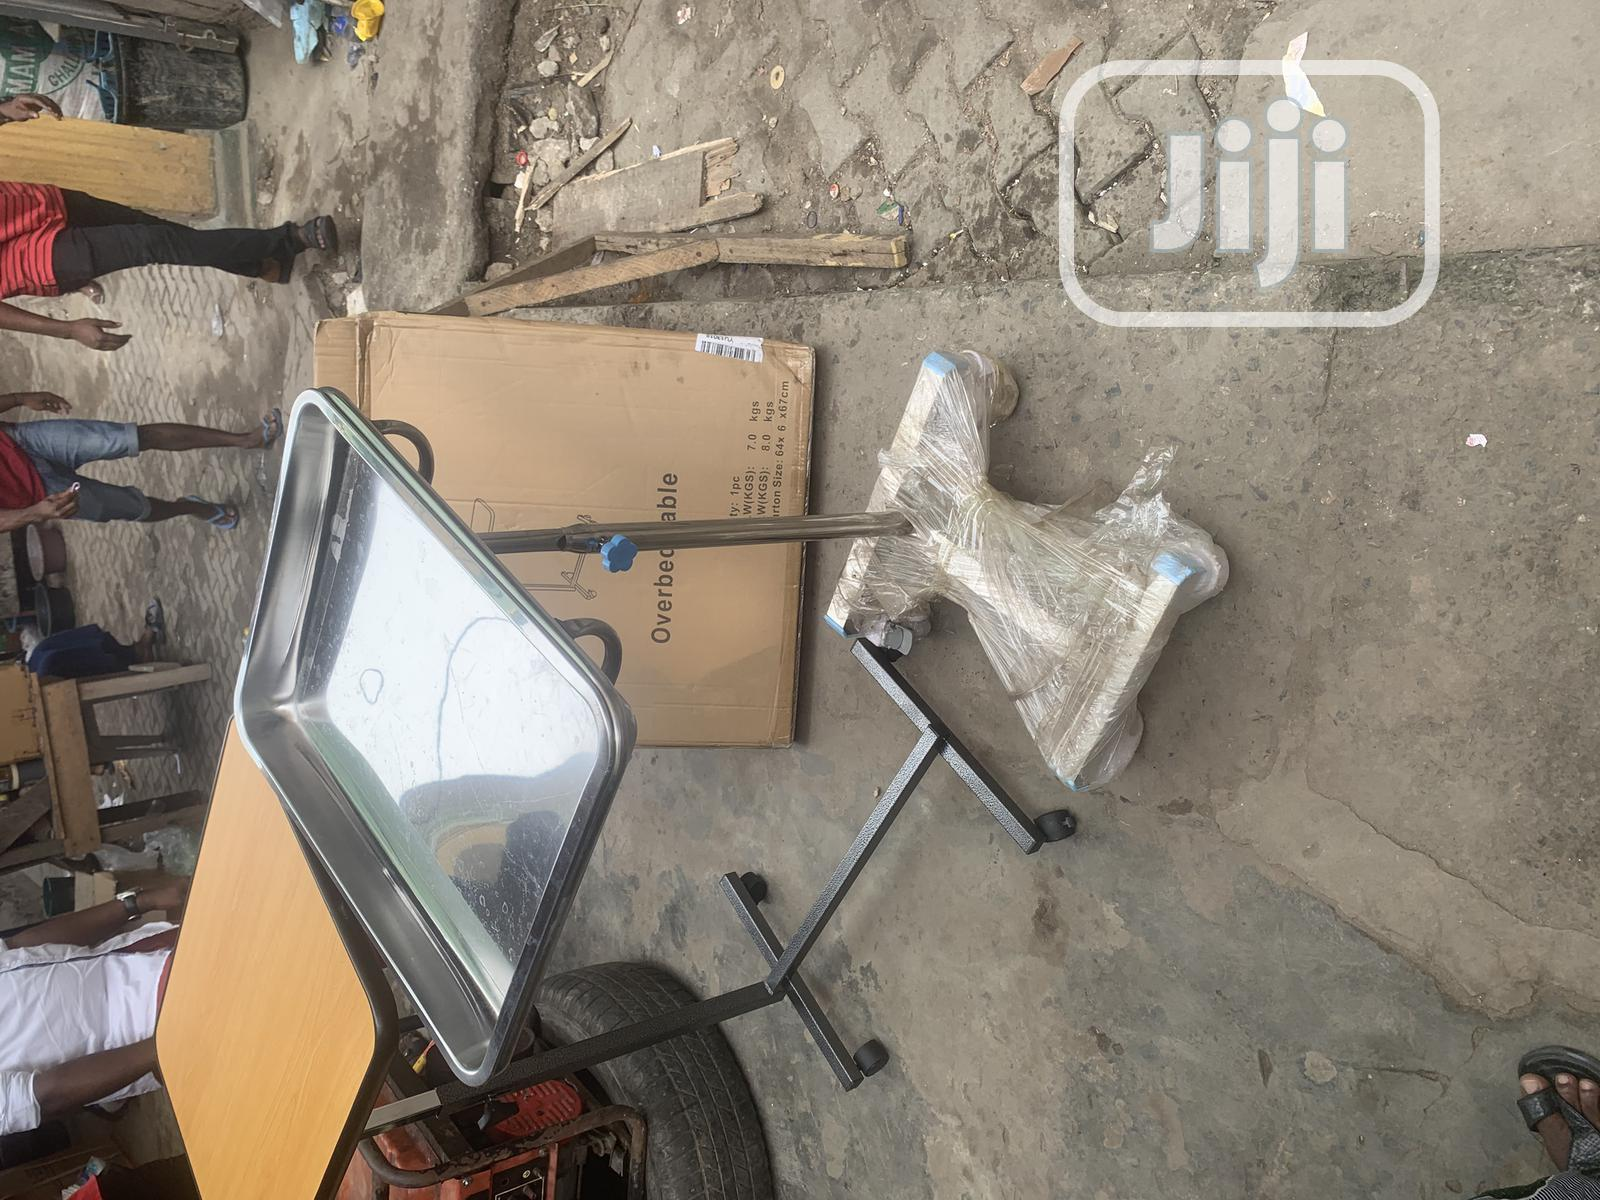 Mayor Trolley | Medical Supplies & Equipment for sale in Amuwo-Odofin, Lagos State, Nigeria